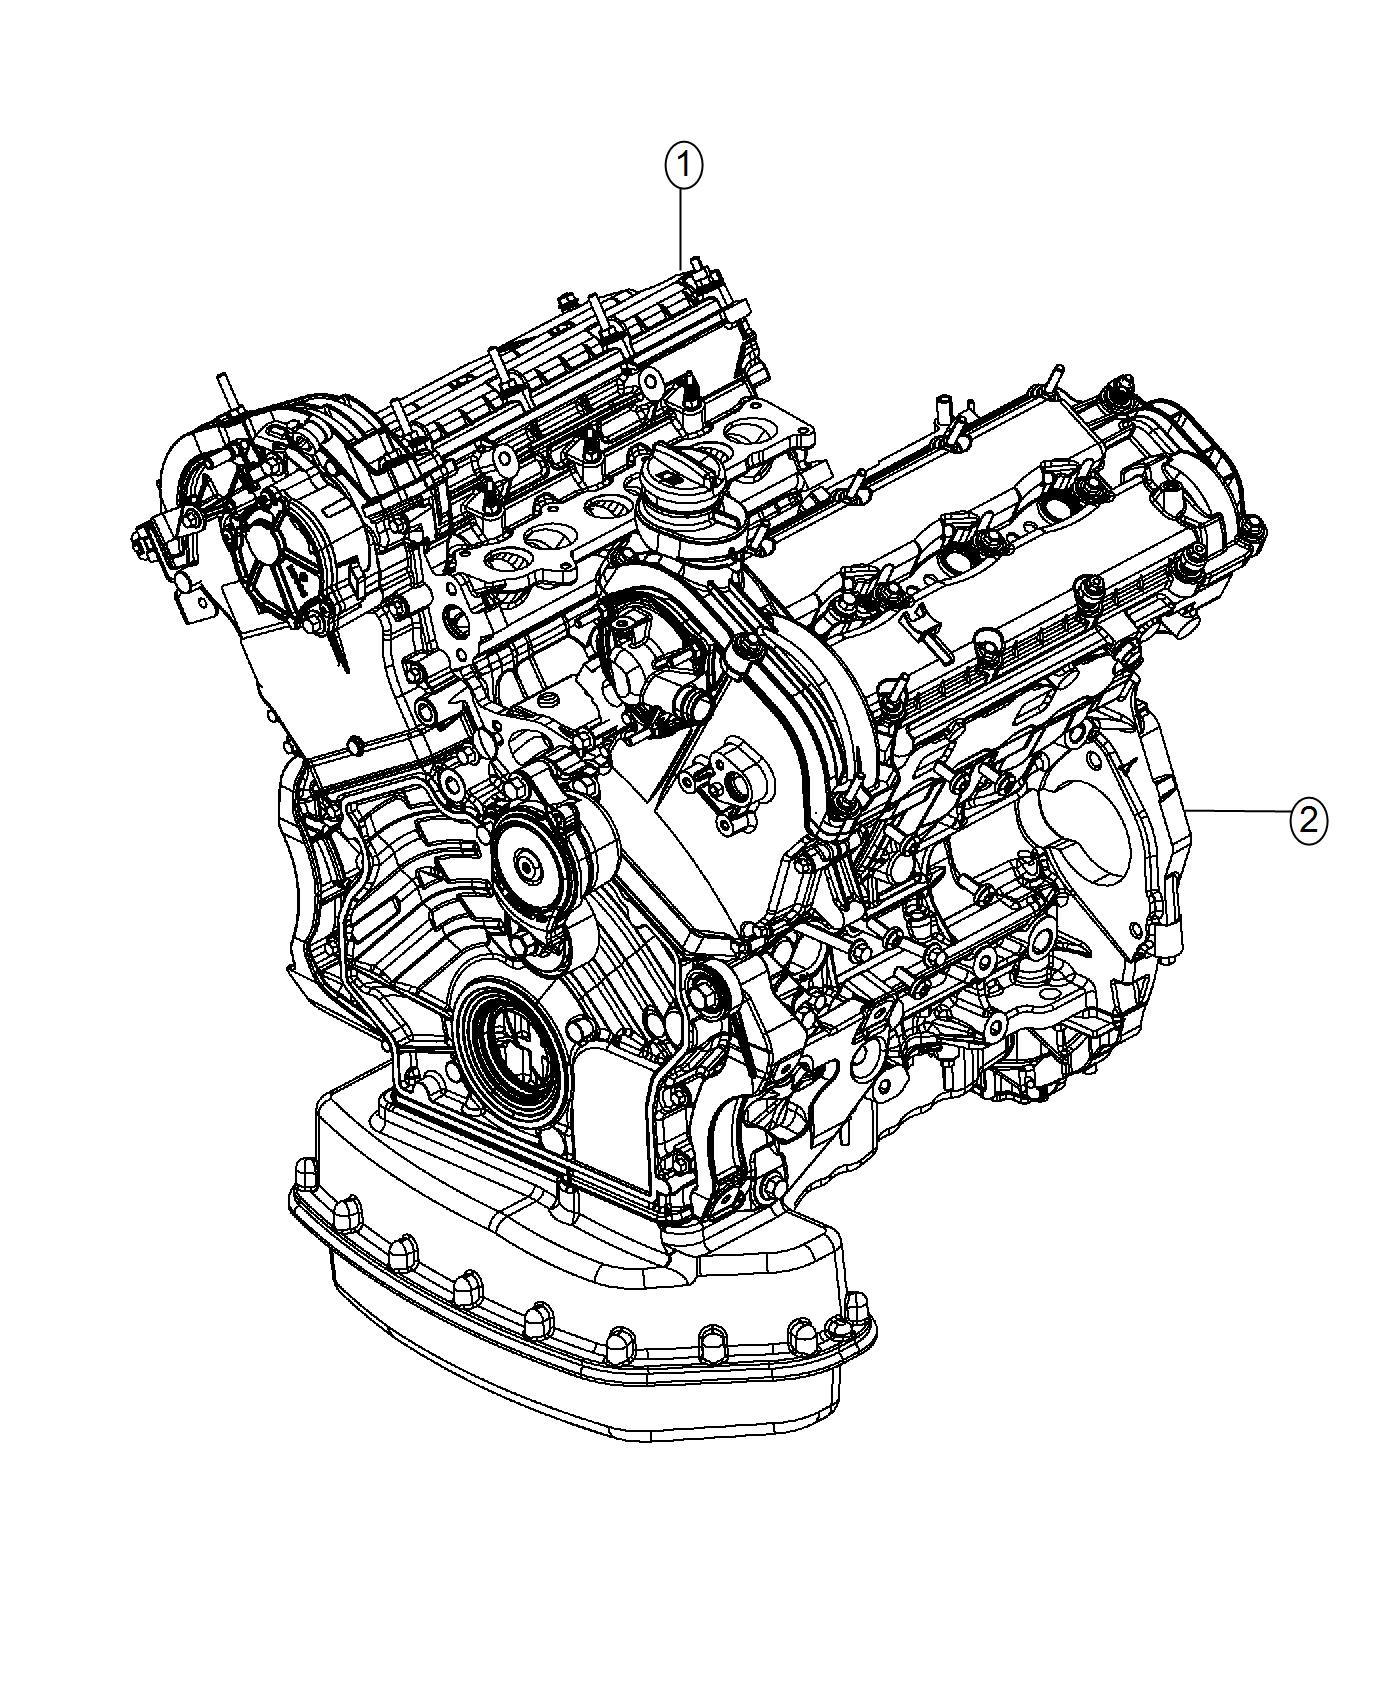 2017 Ram 1500 Engine  Complete